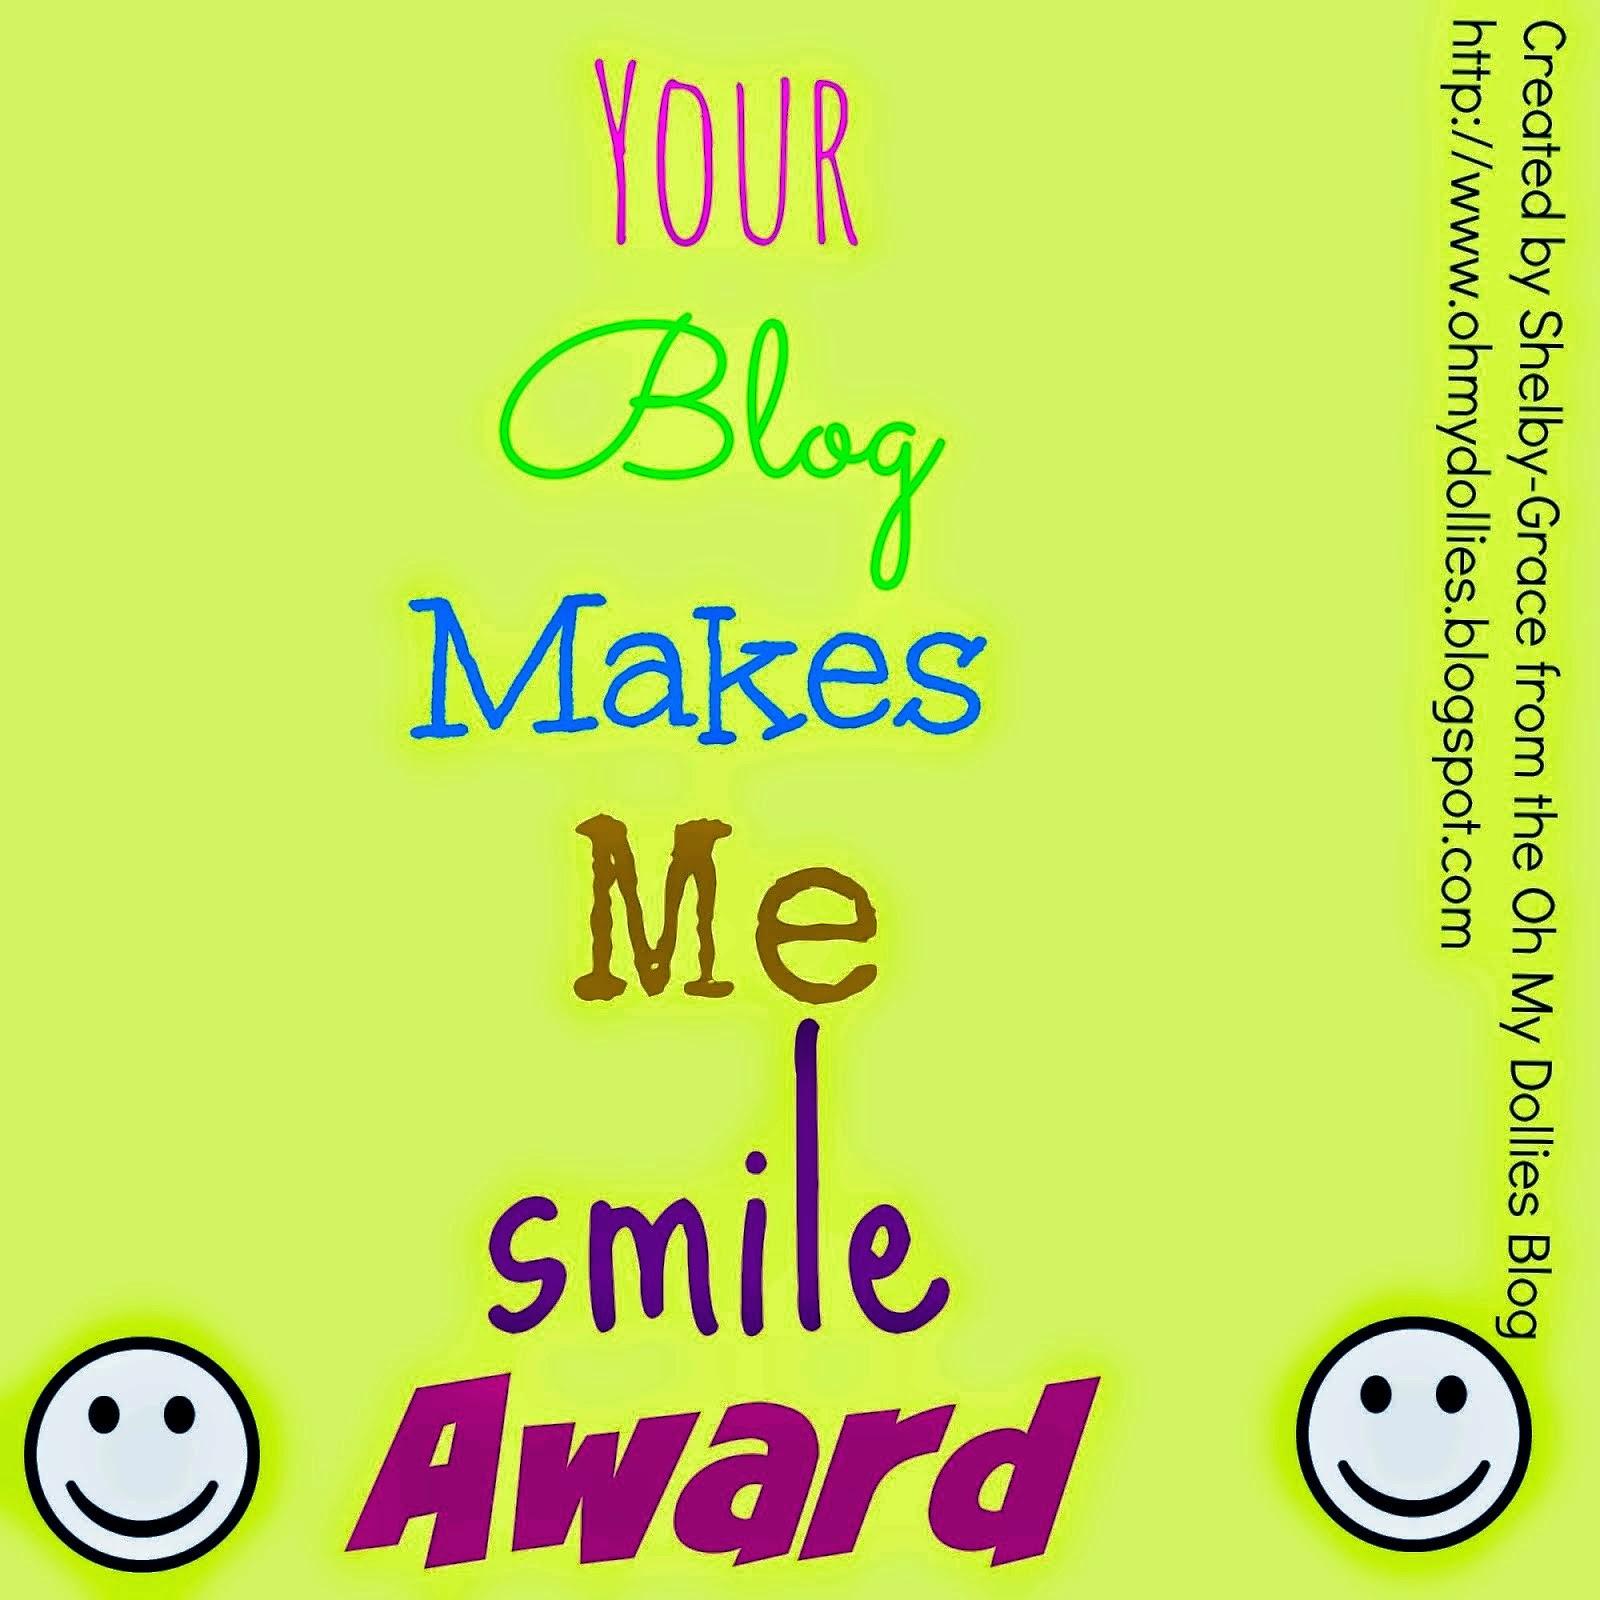 Your Blog Makes Me Smile Award